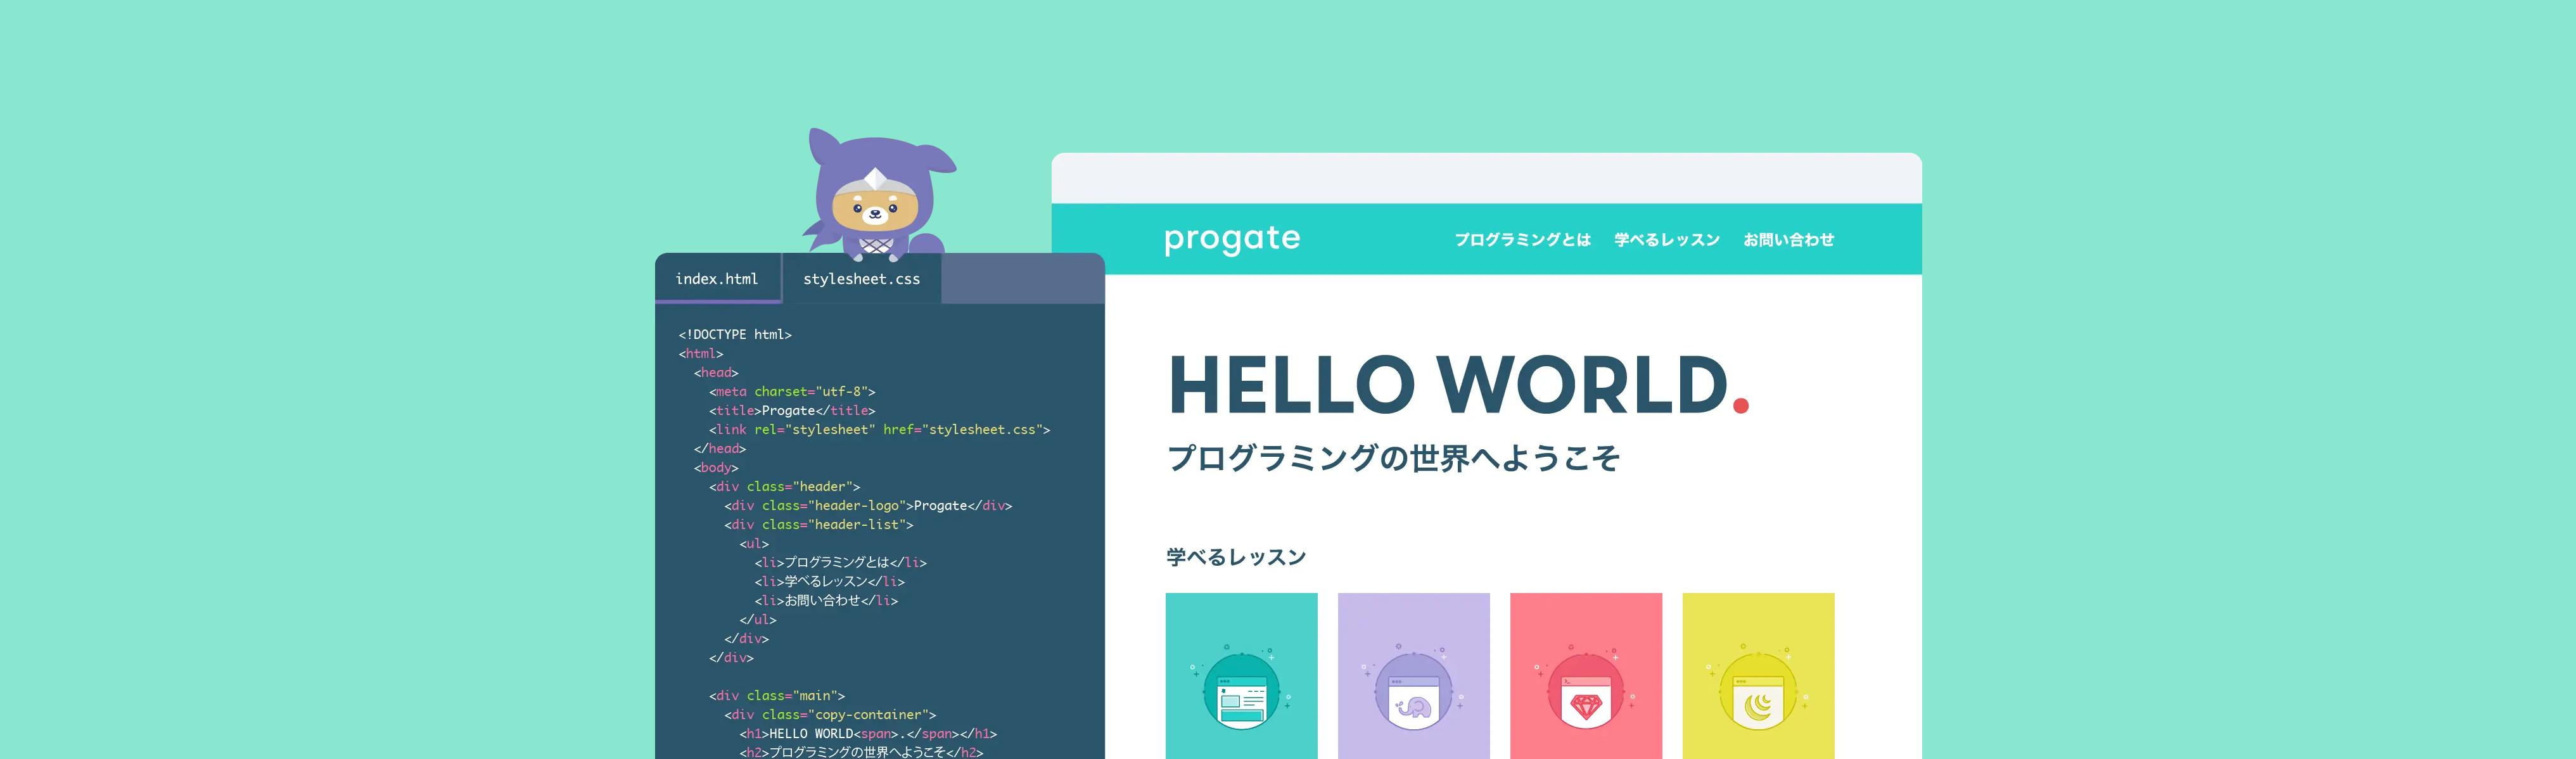 Progateのメインサイト